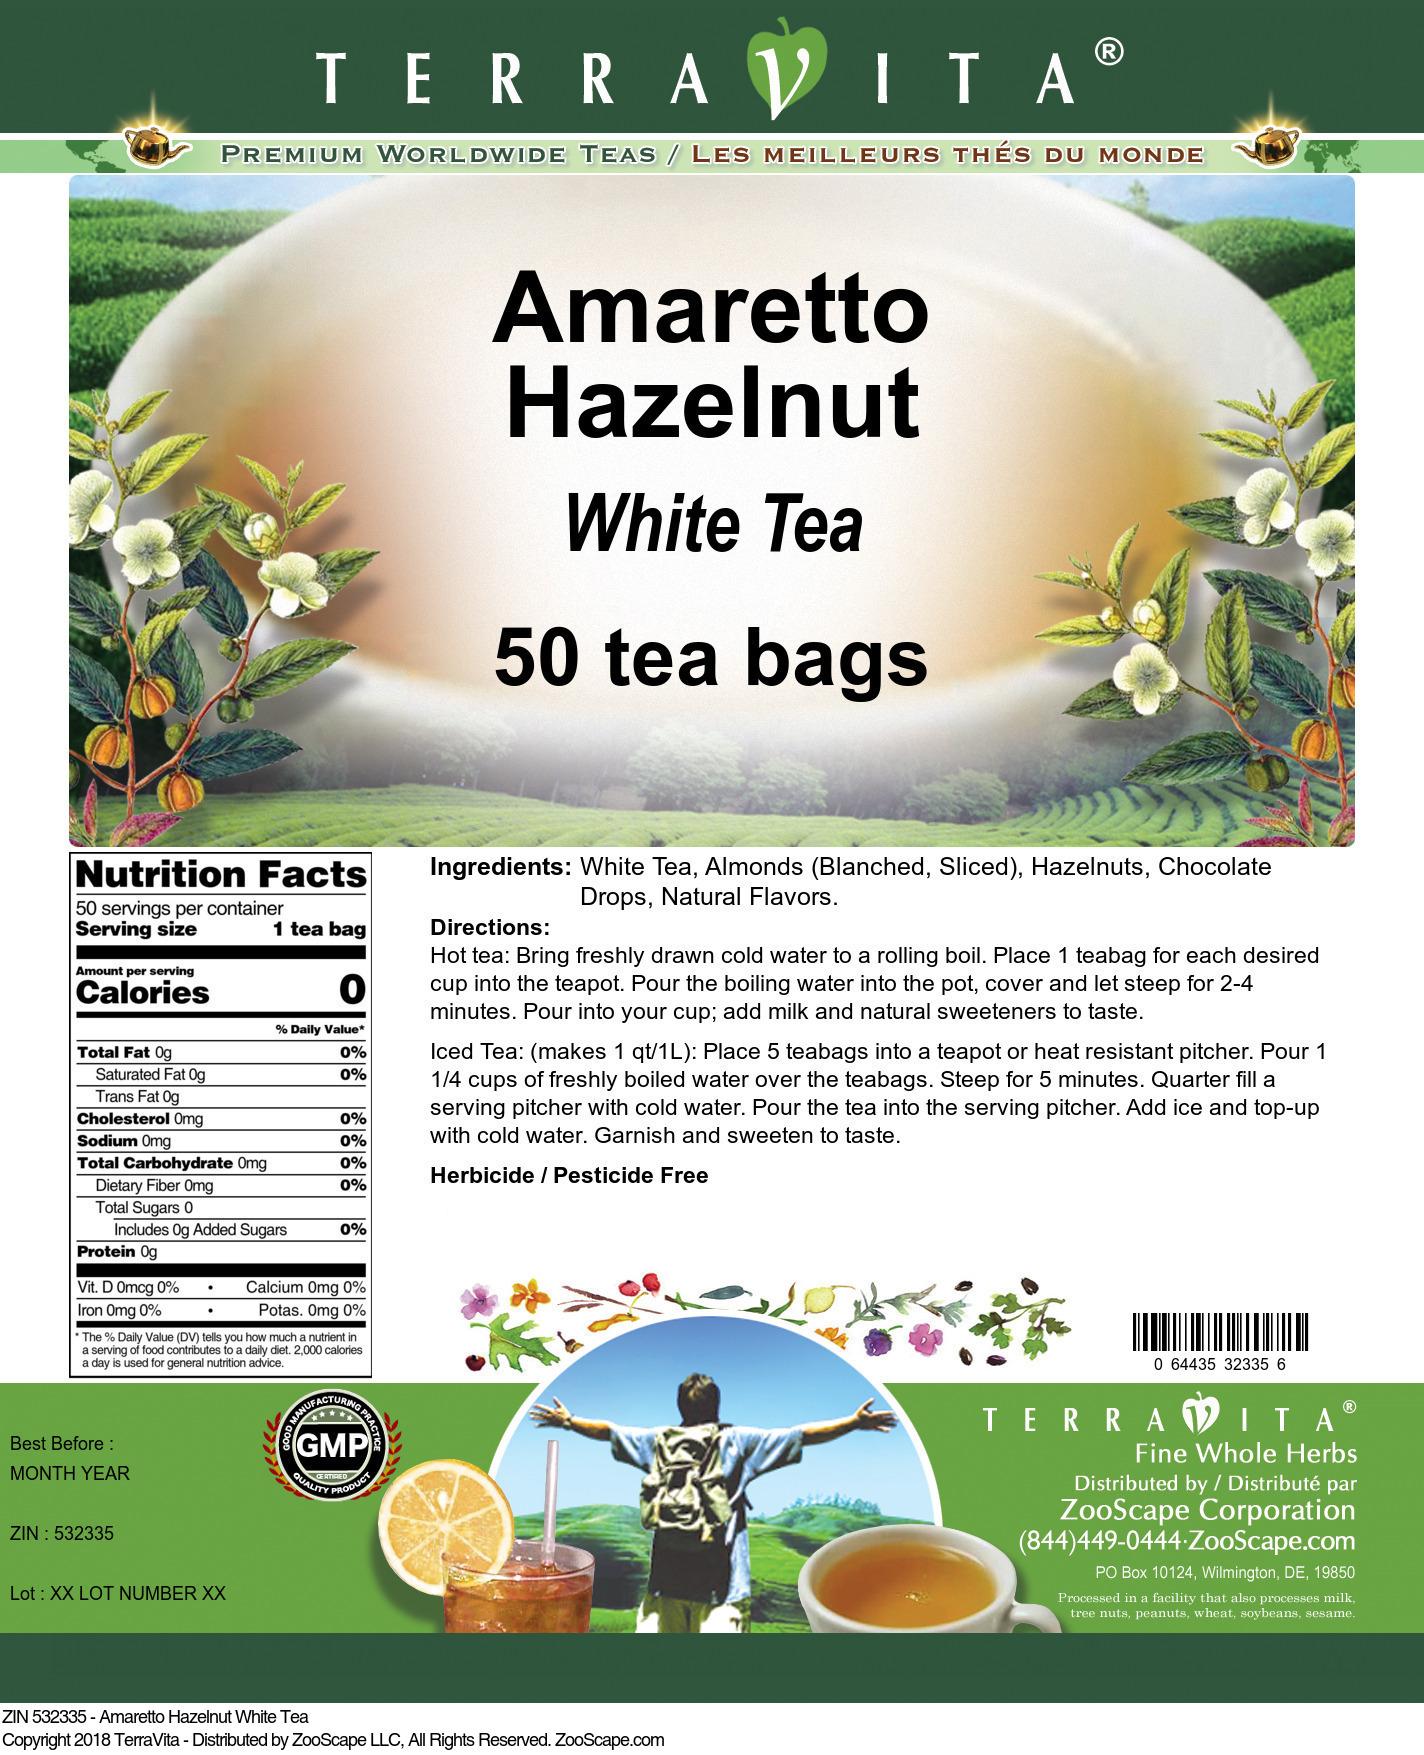 Amaretto Hazelnut White Tea